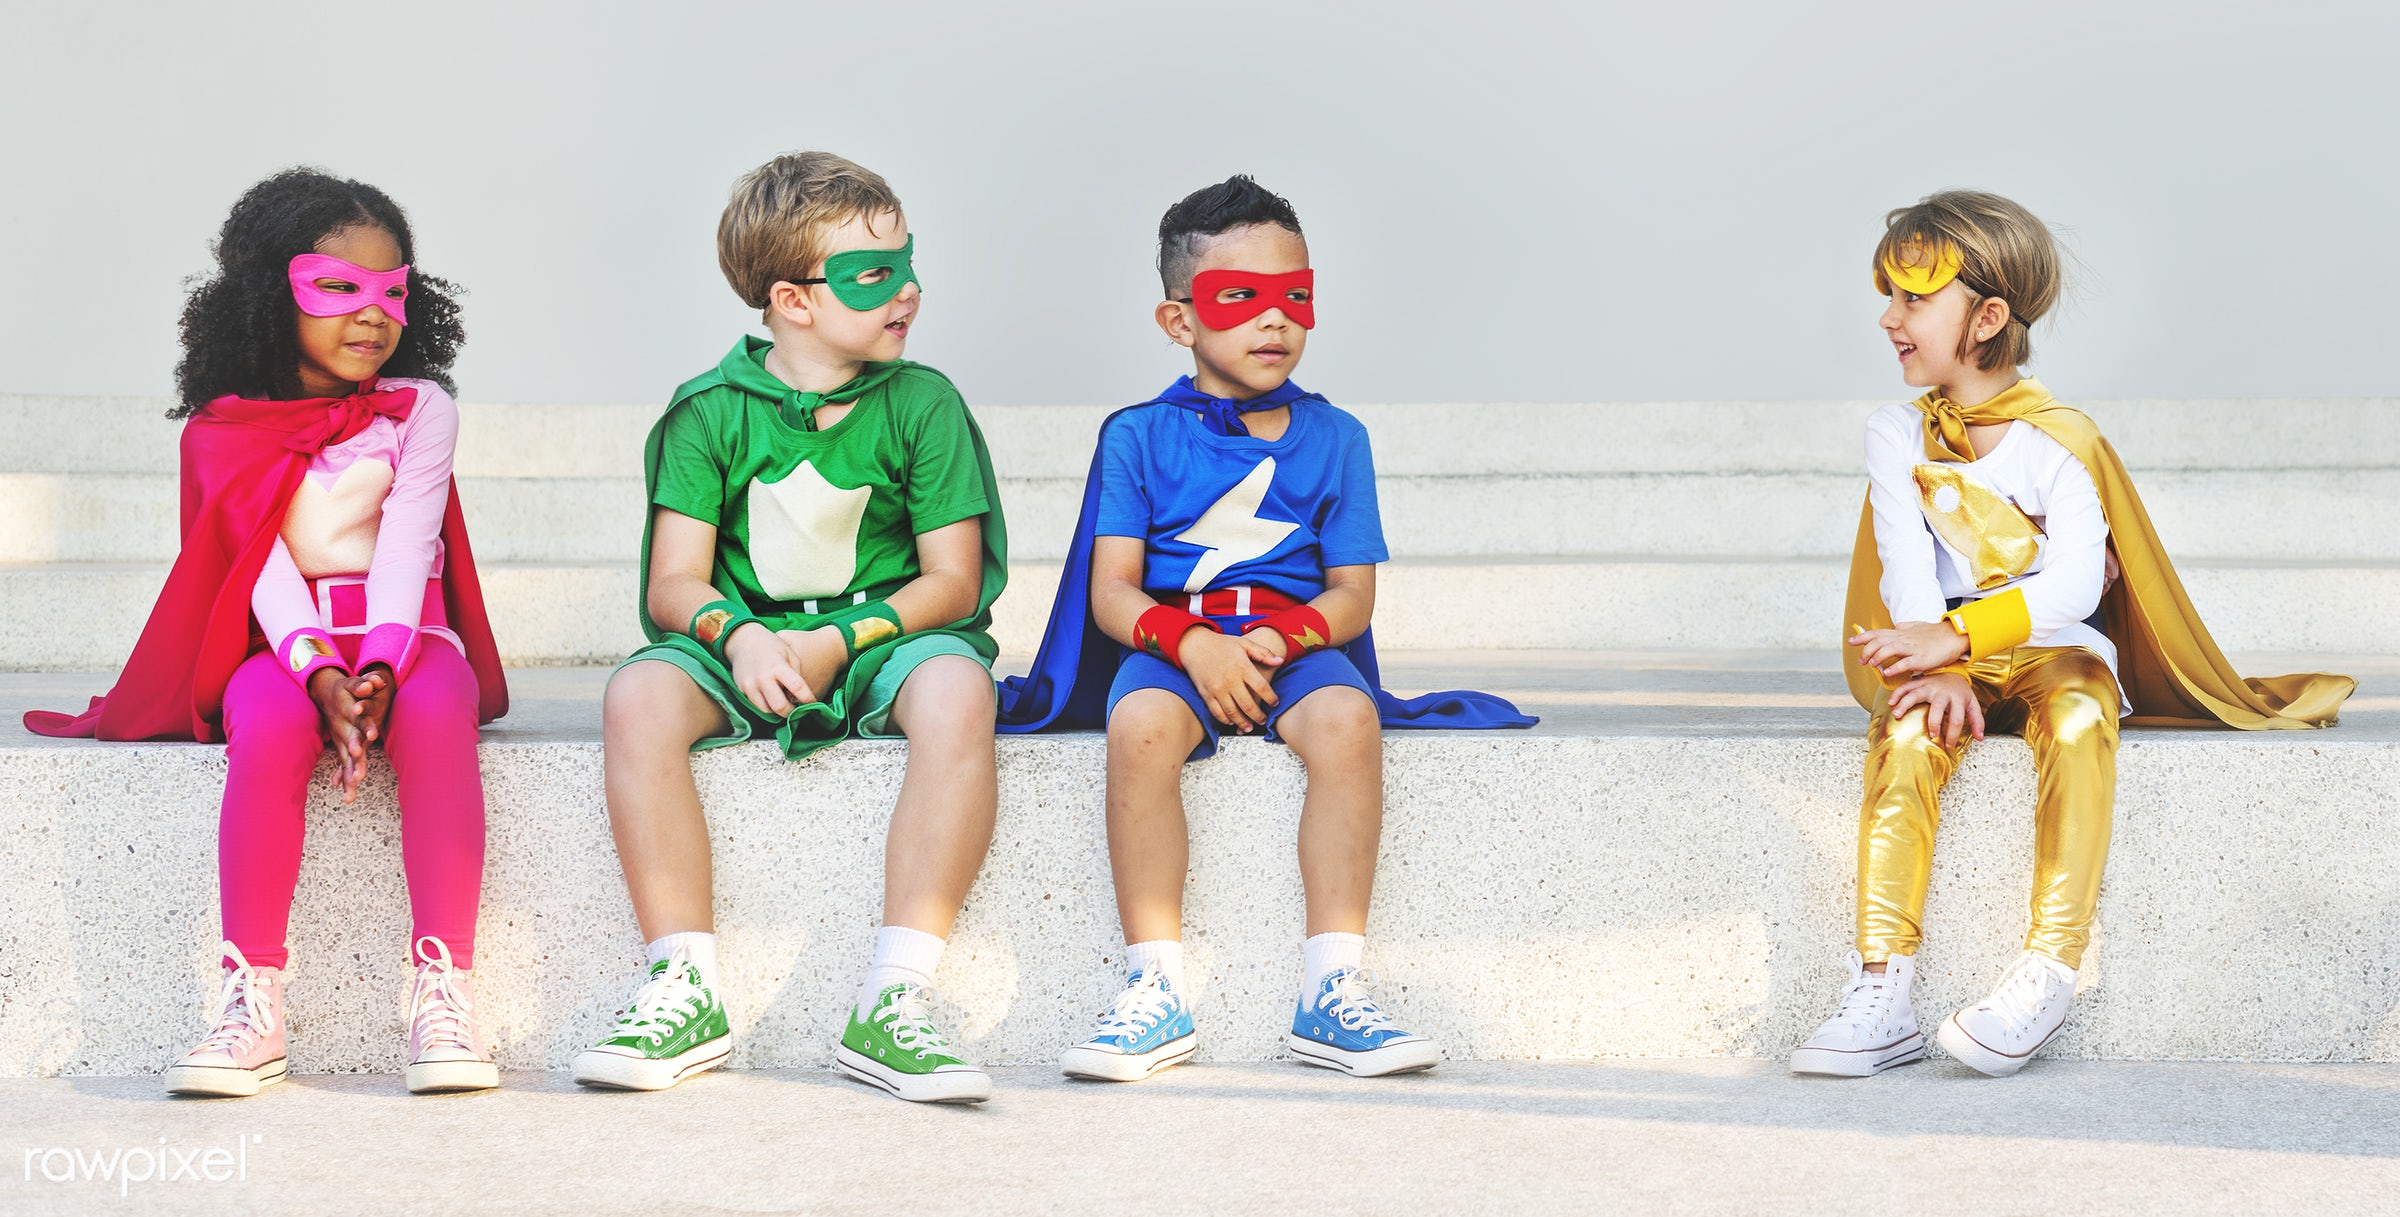 cape, superhero, adorable, african descent, asian ethnicity, aspiration, boys, cheerful, child, childhood, children,...